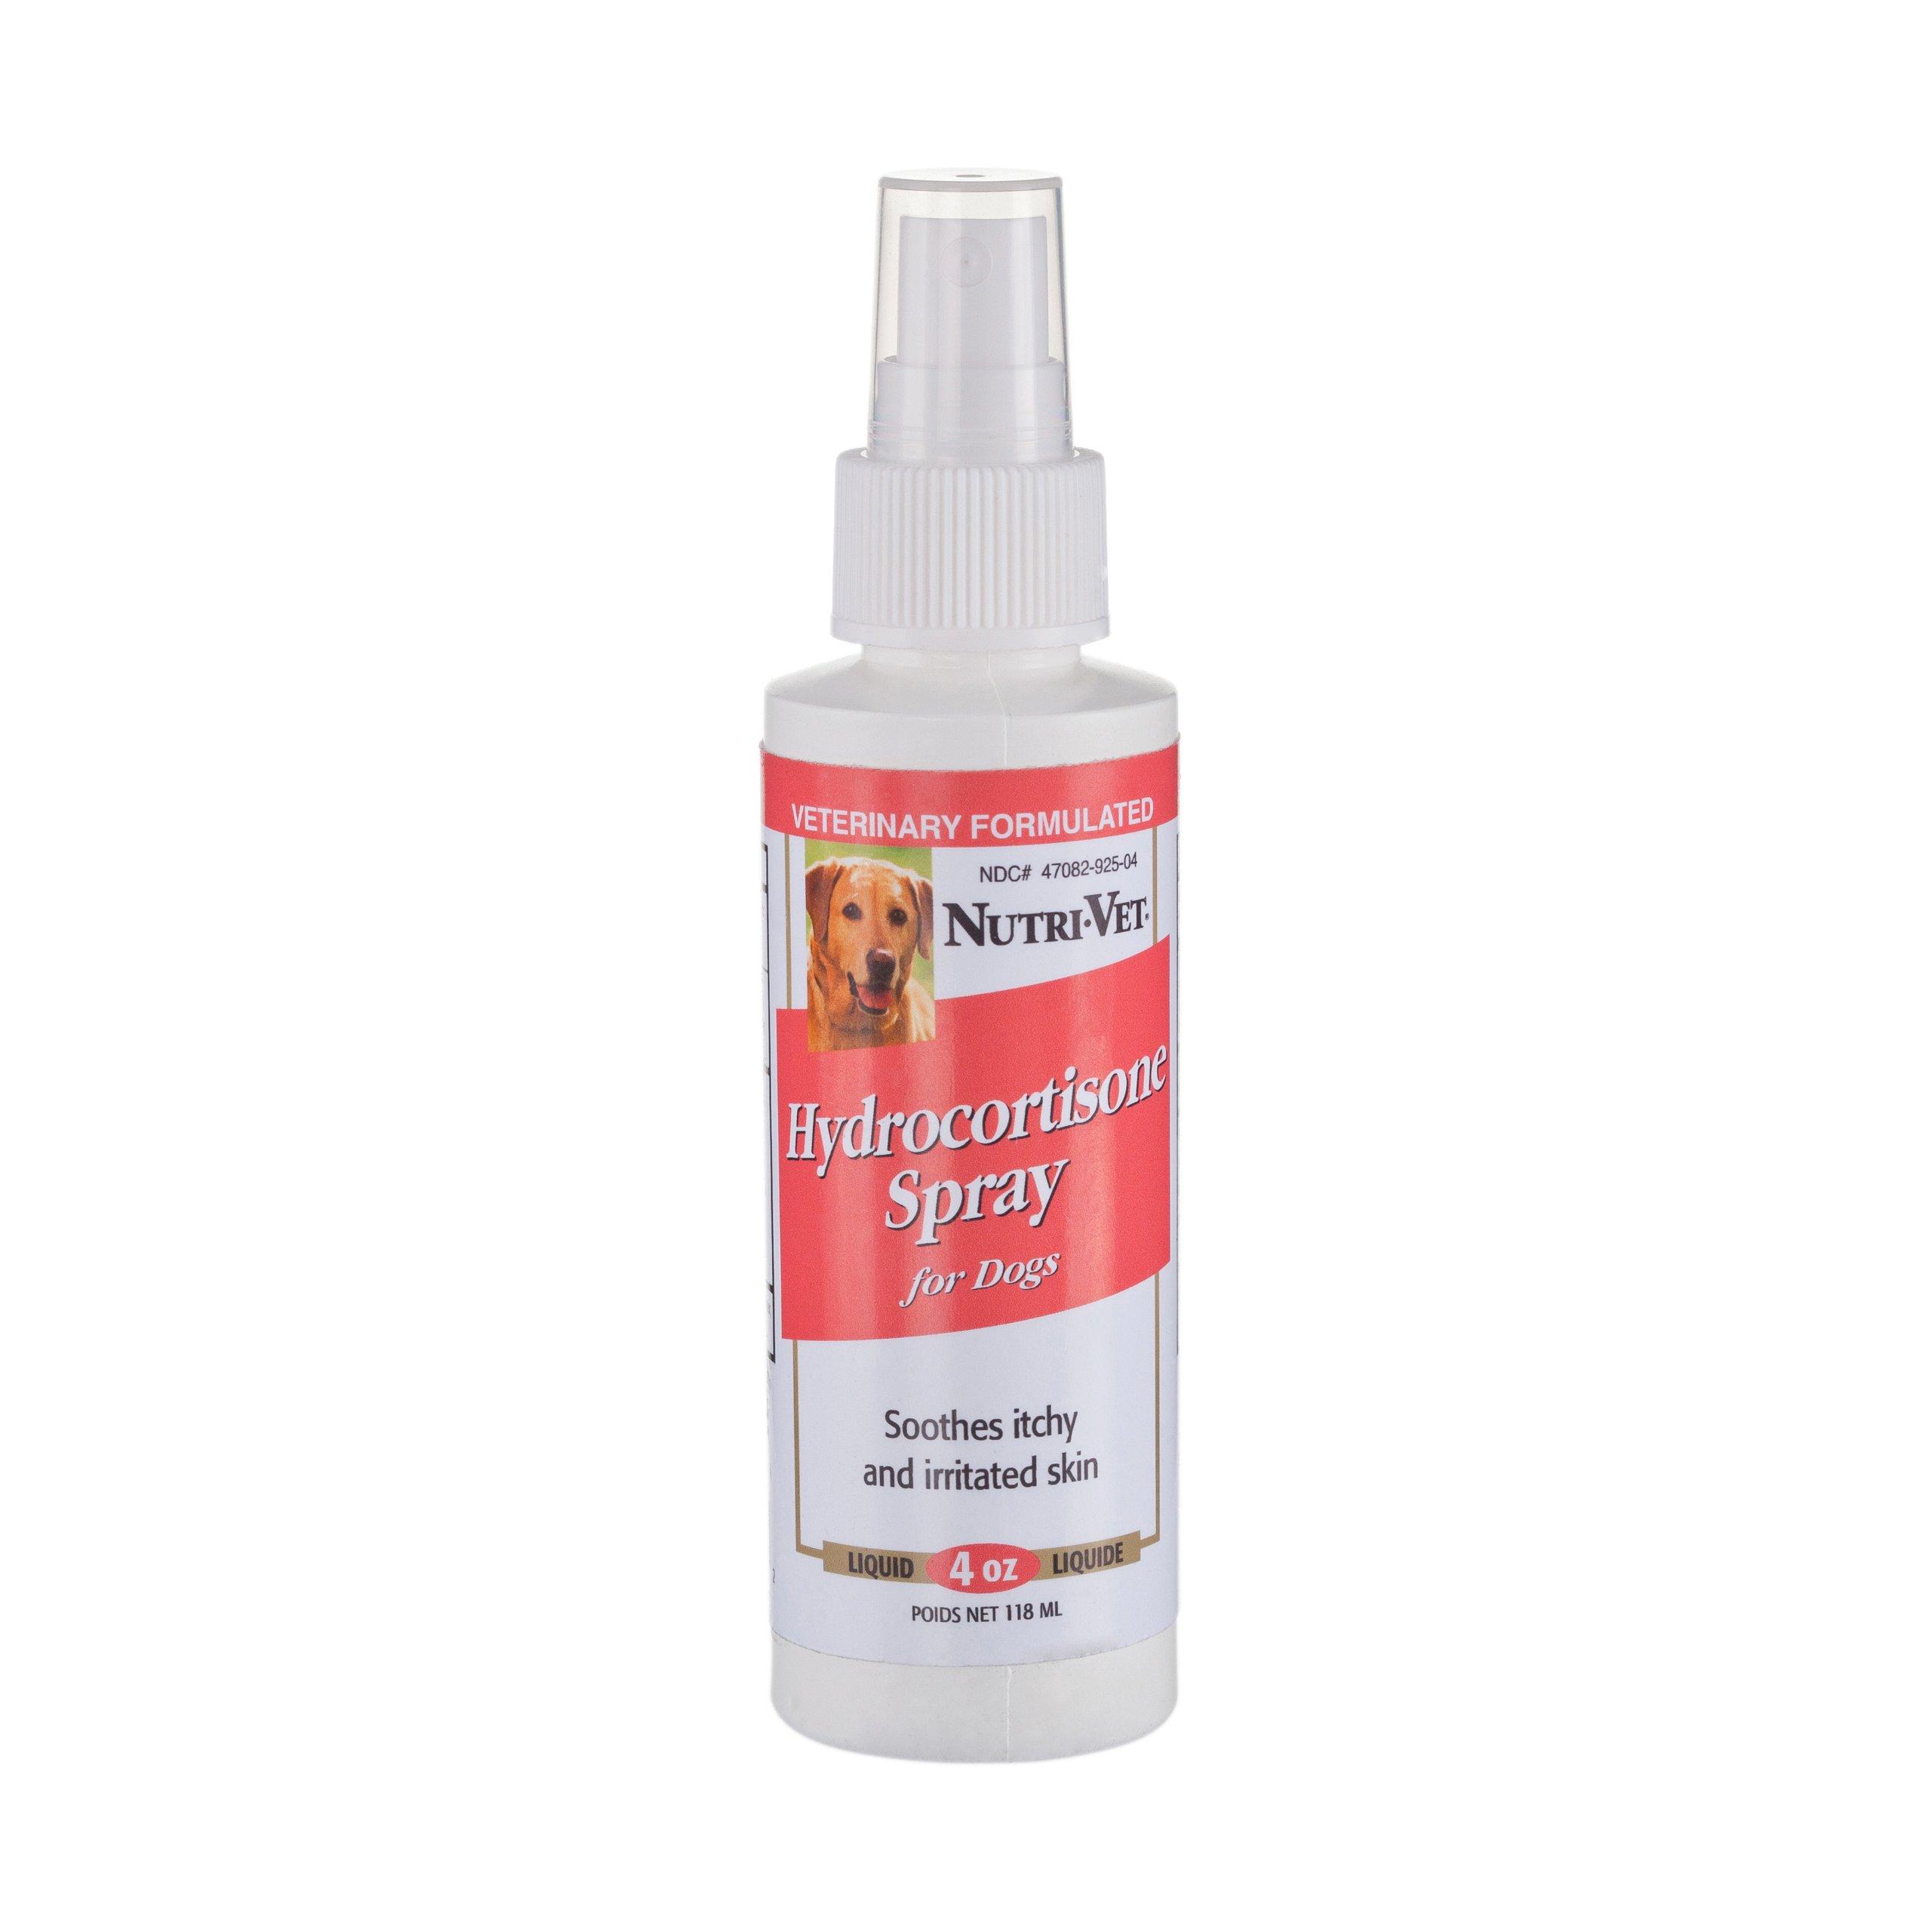 Nutri-Vet Wellness Advanced Hydrocortisone Spray with Aloe Vera for Pets, 4-Ounce